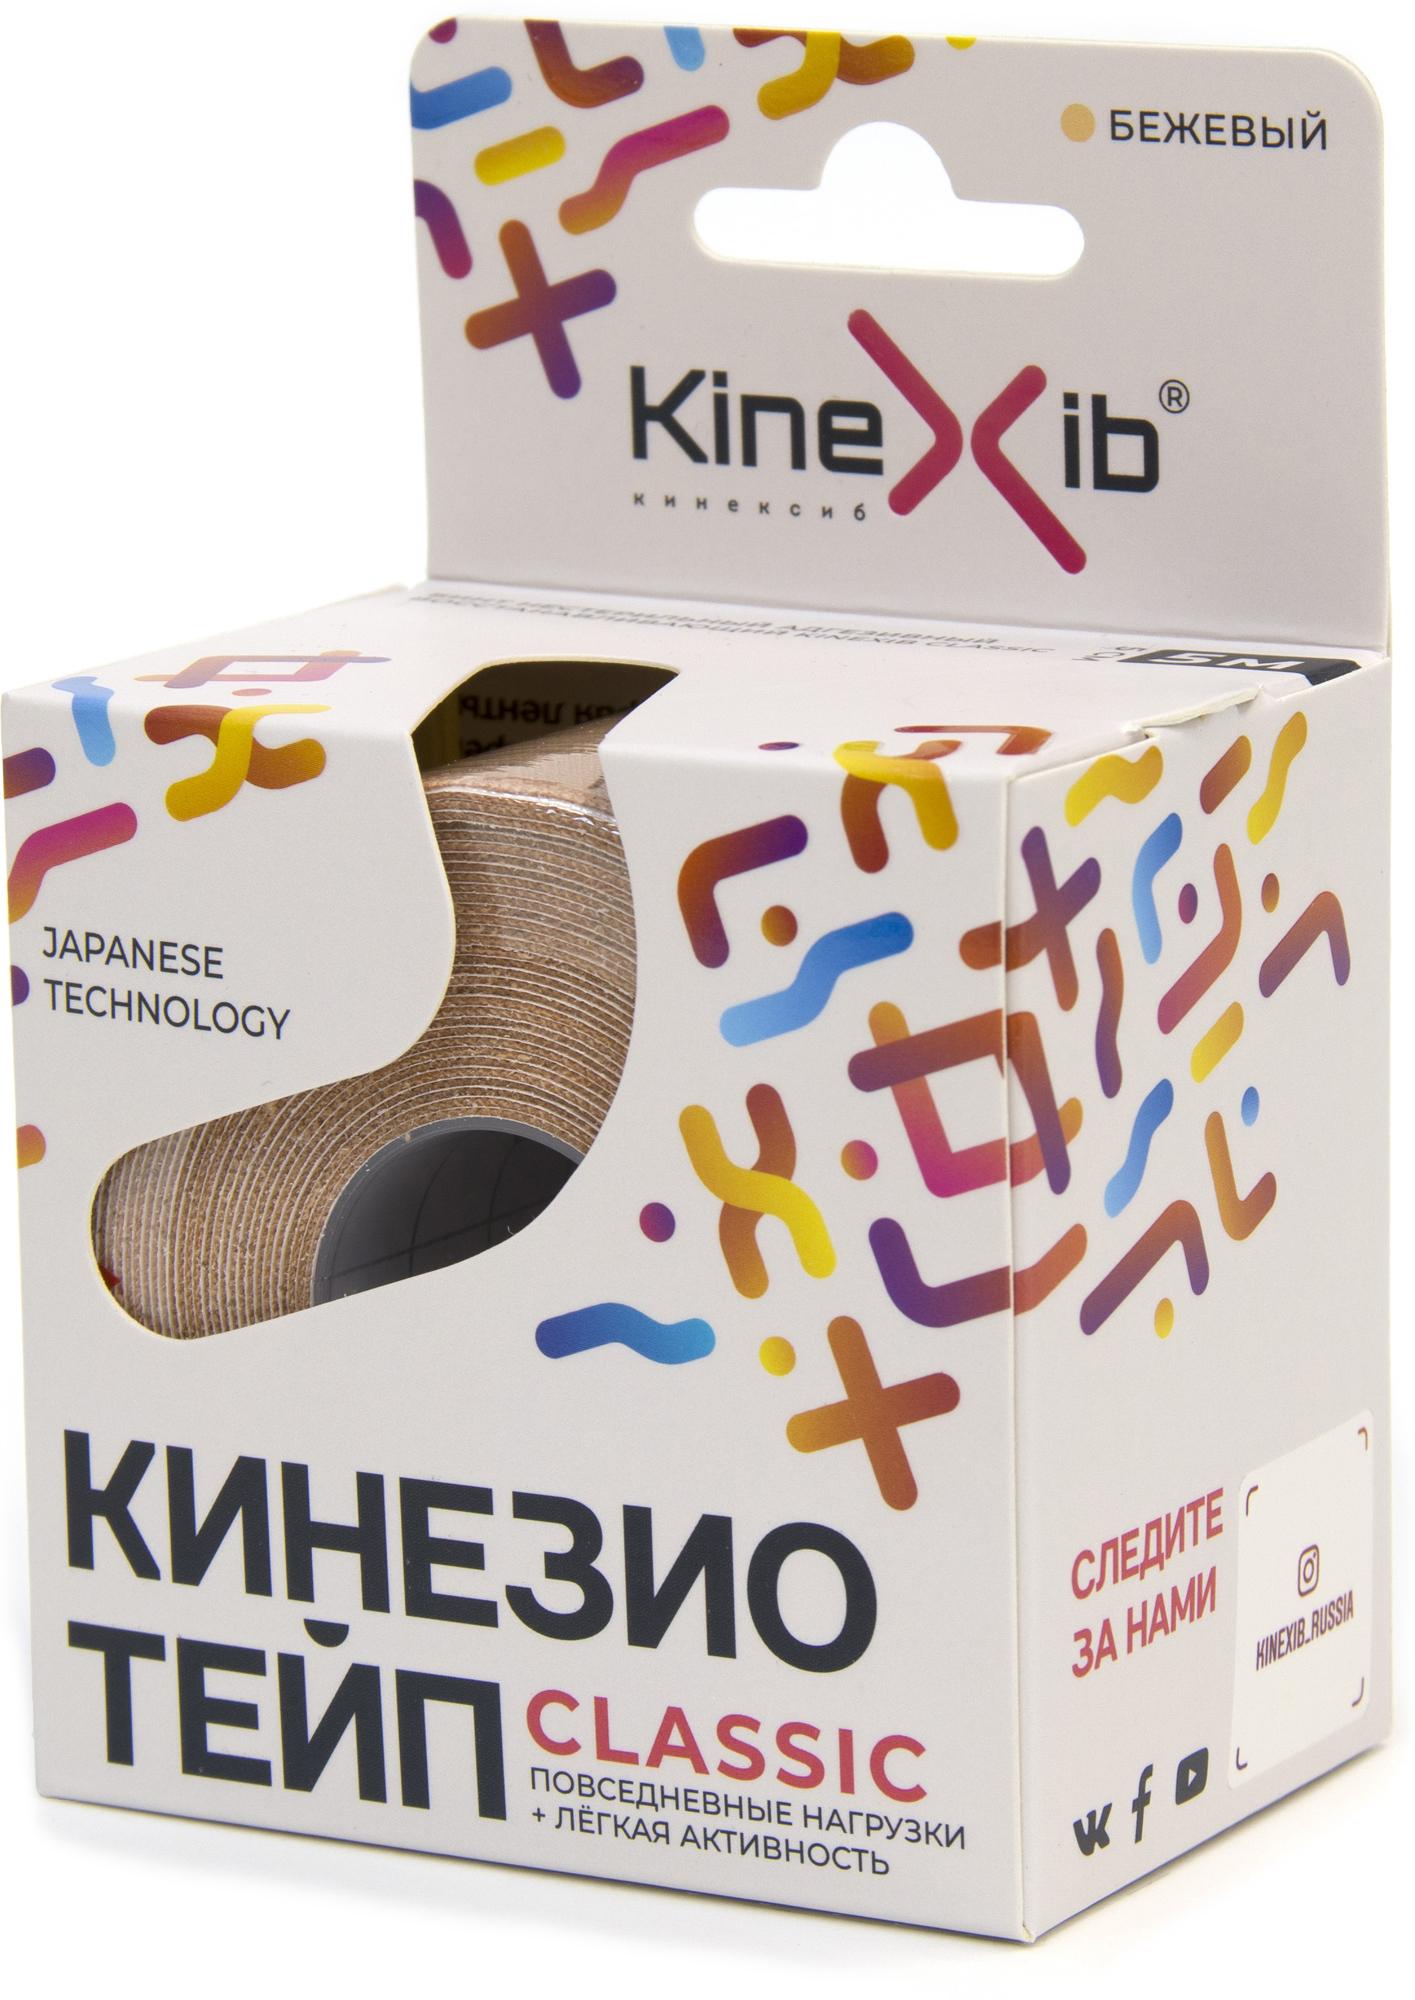 Kinexib Кинезио-тейп Kinexib, бежевый